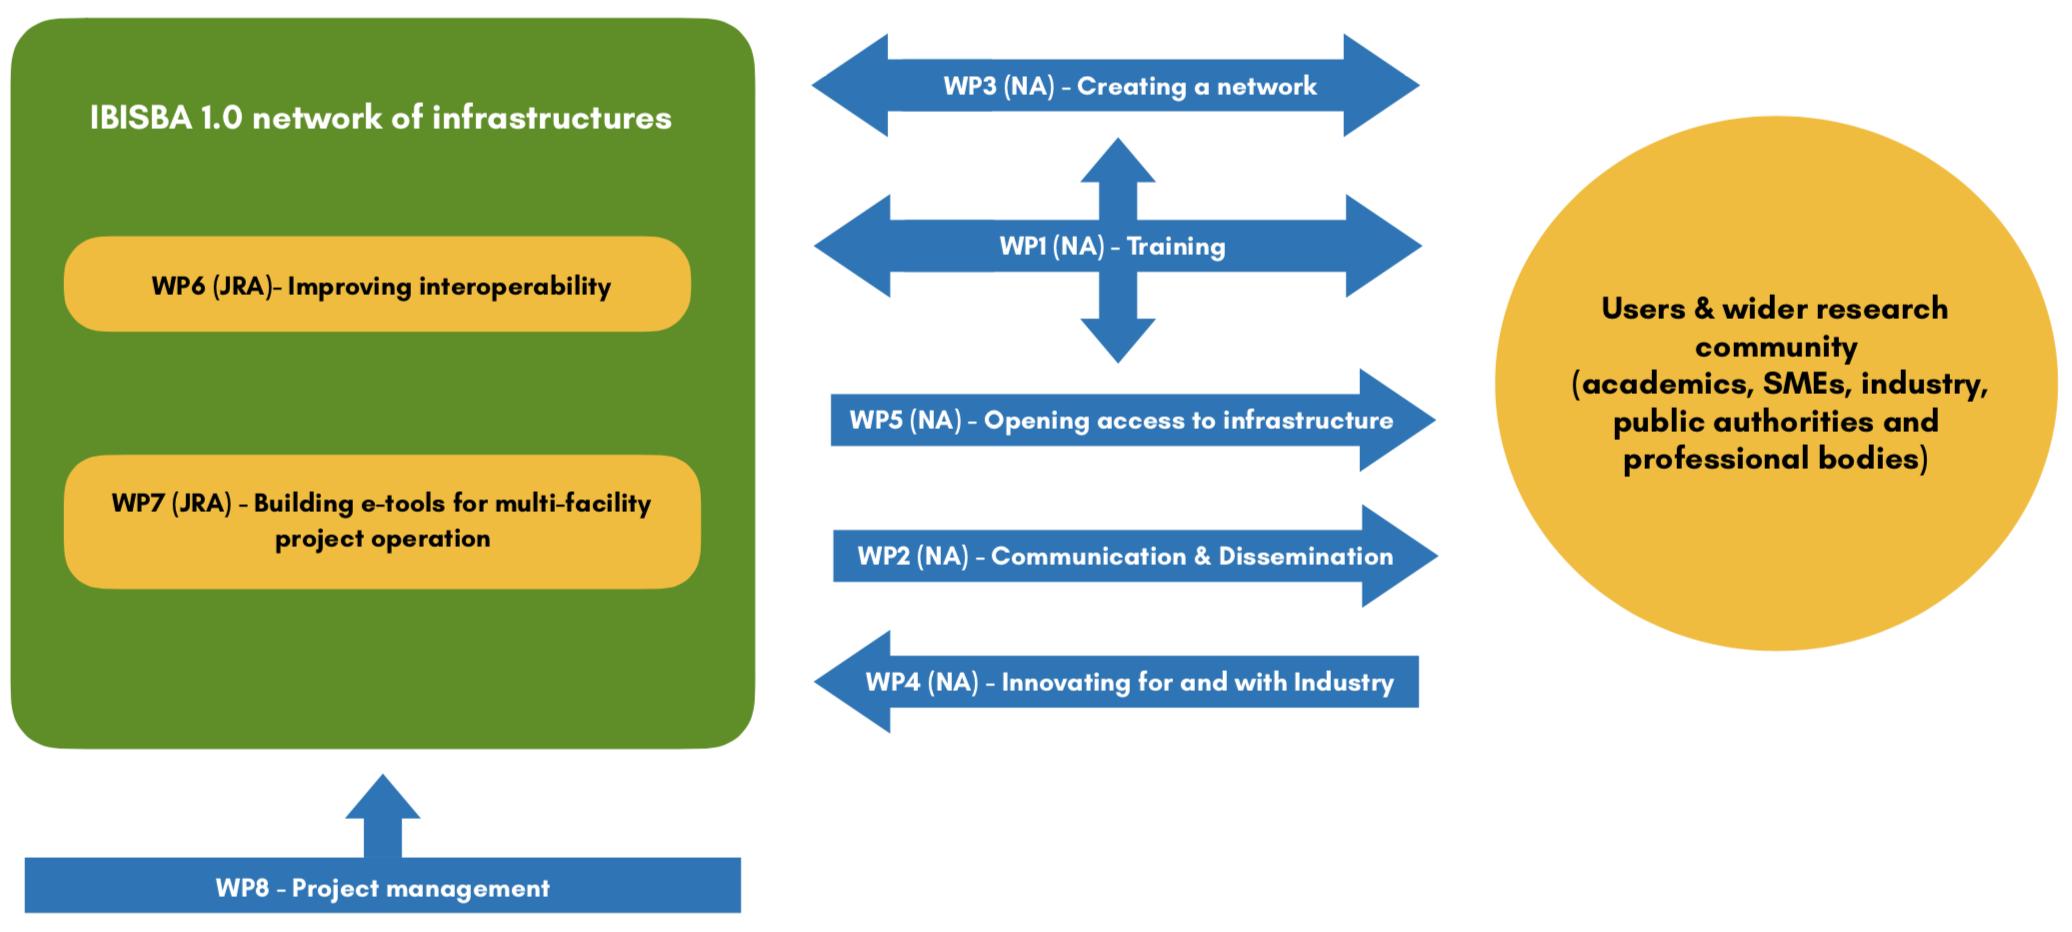 Web structure image